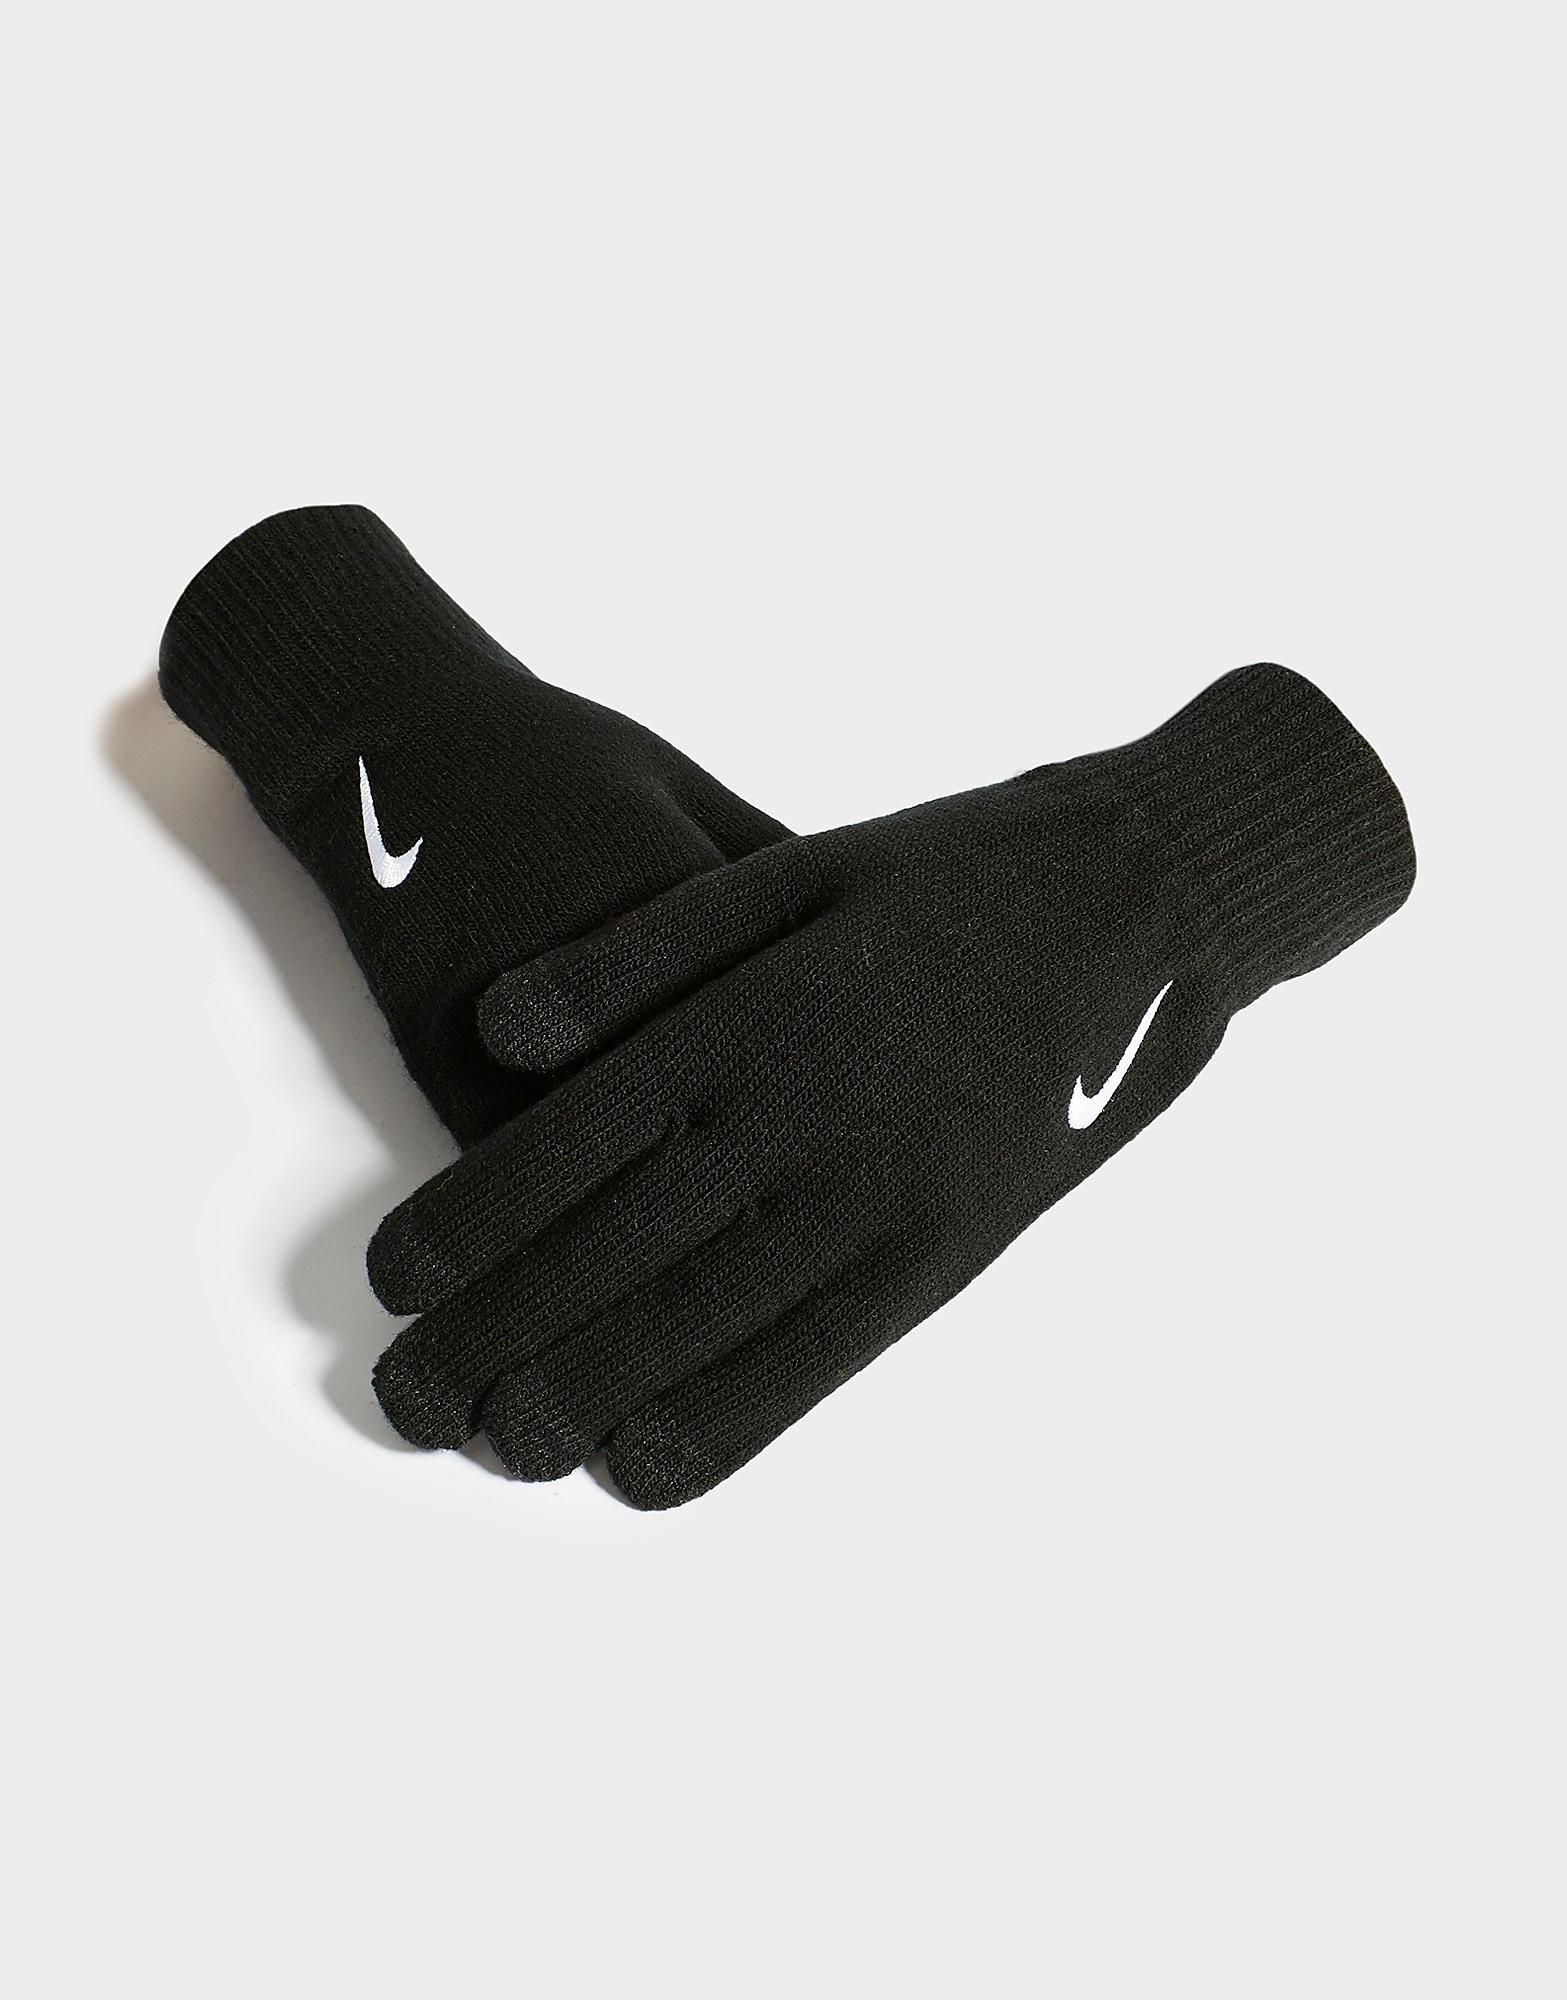 Nike Knit Gloves